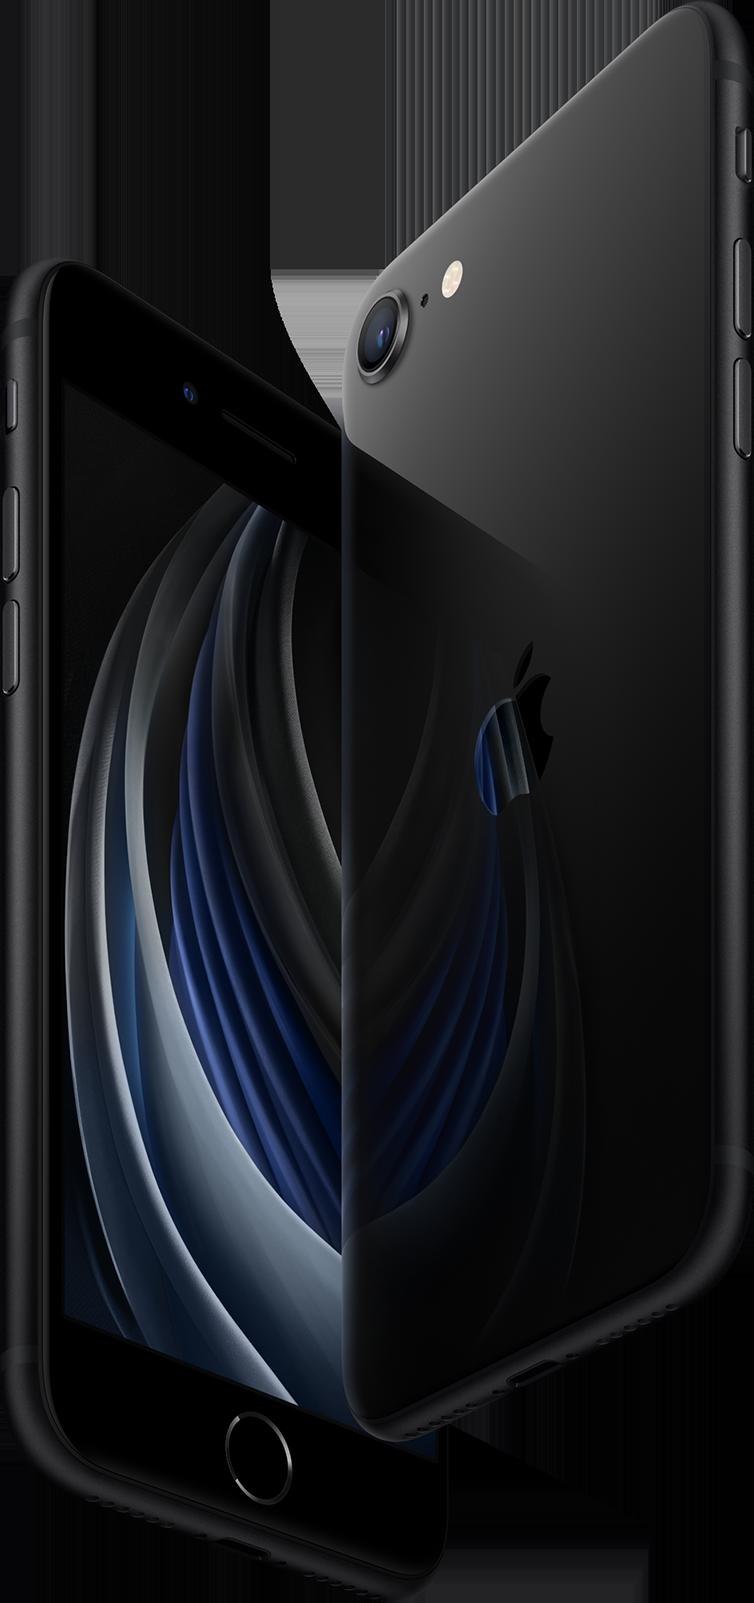 iphoneSEイメージ